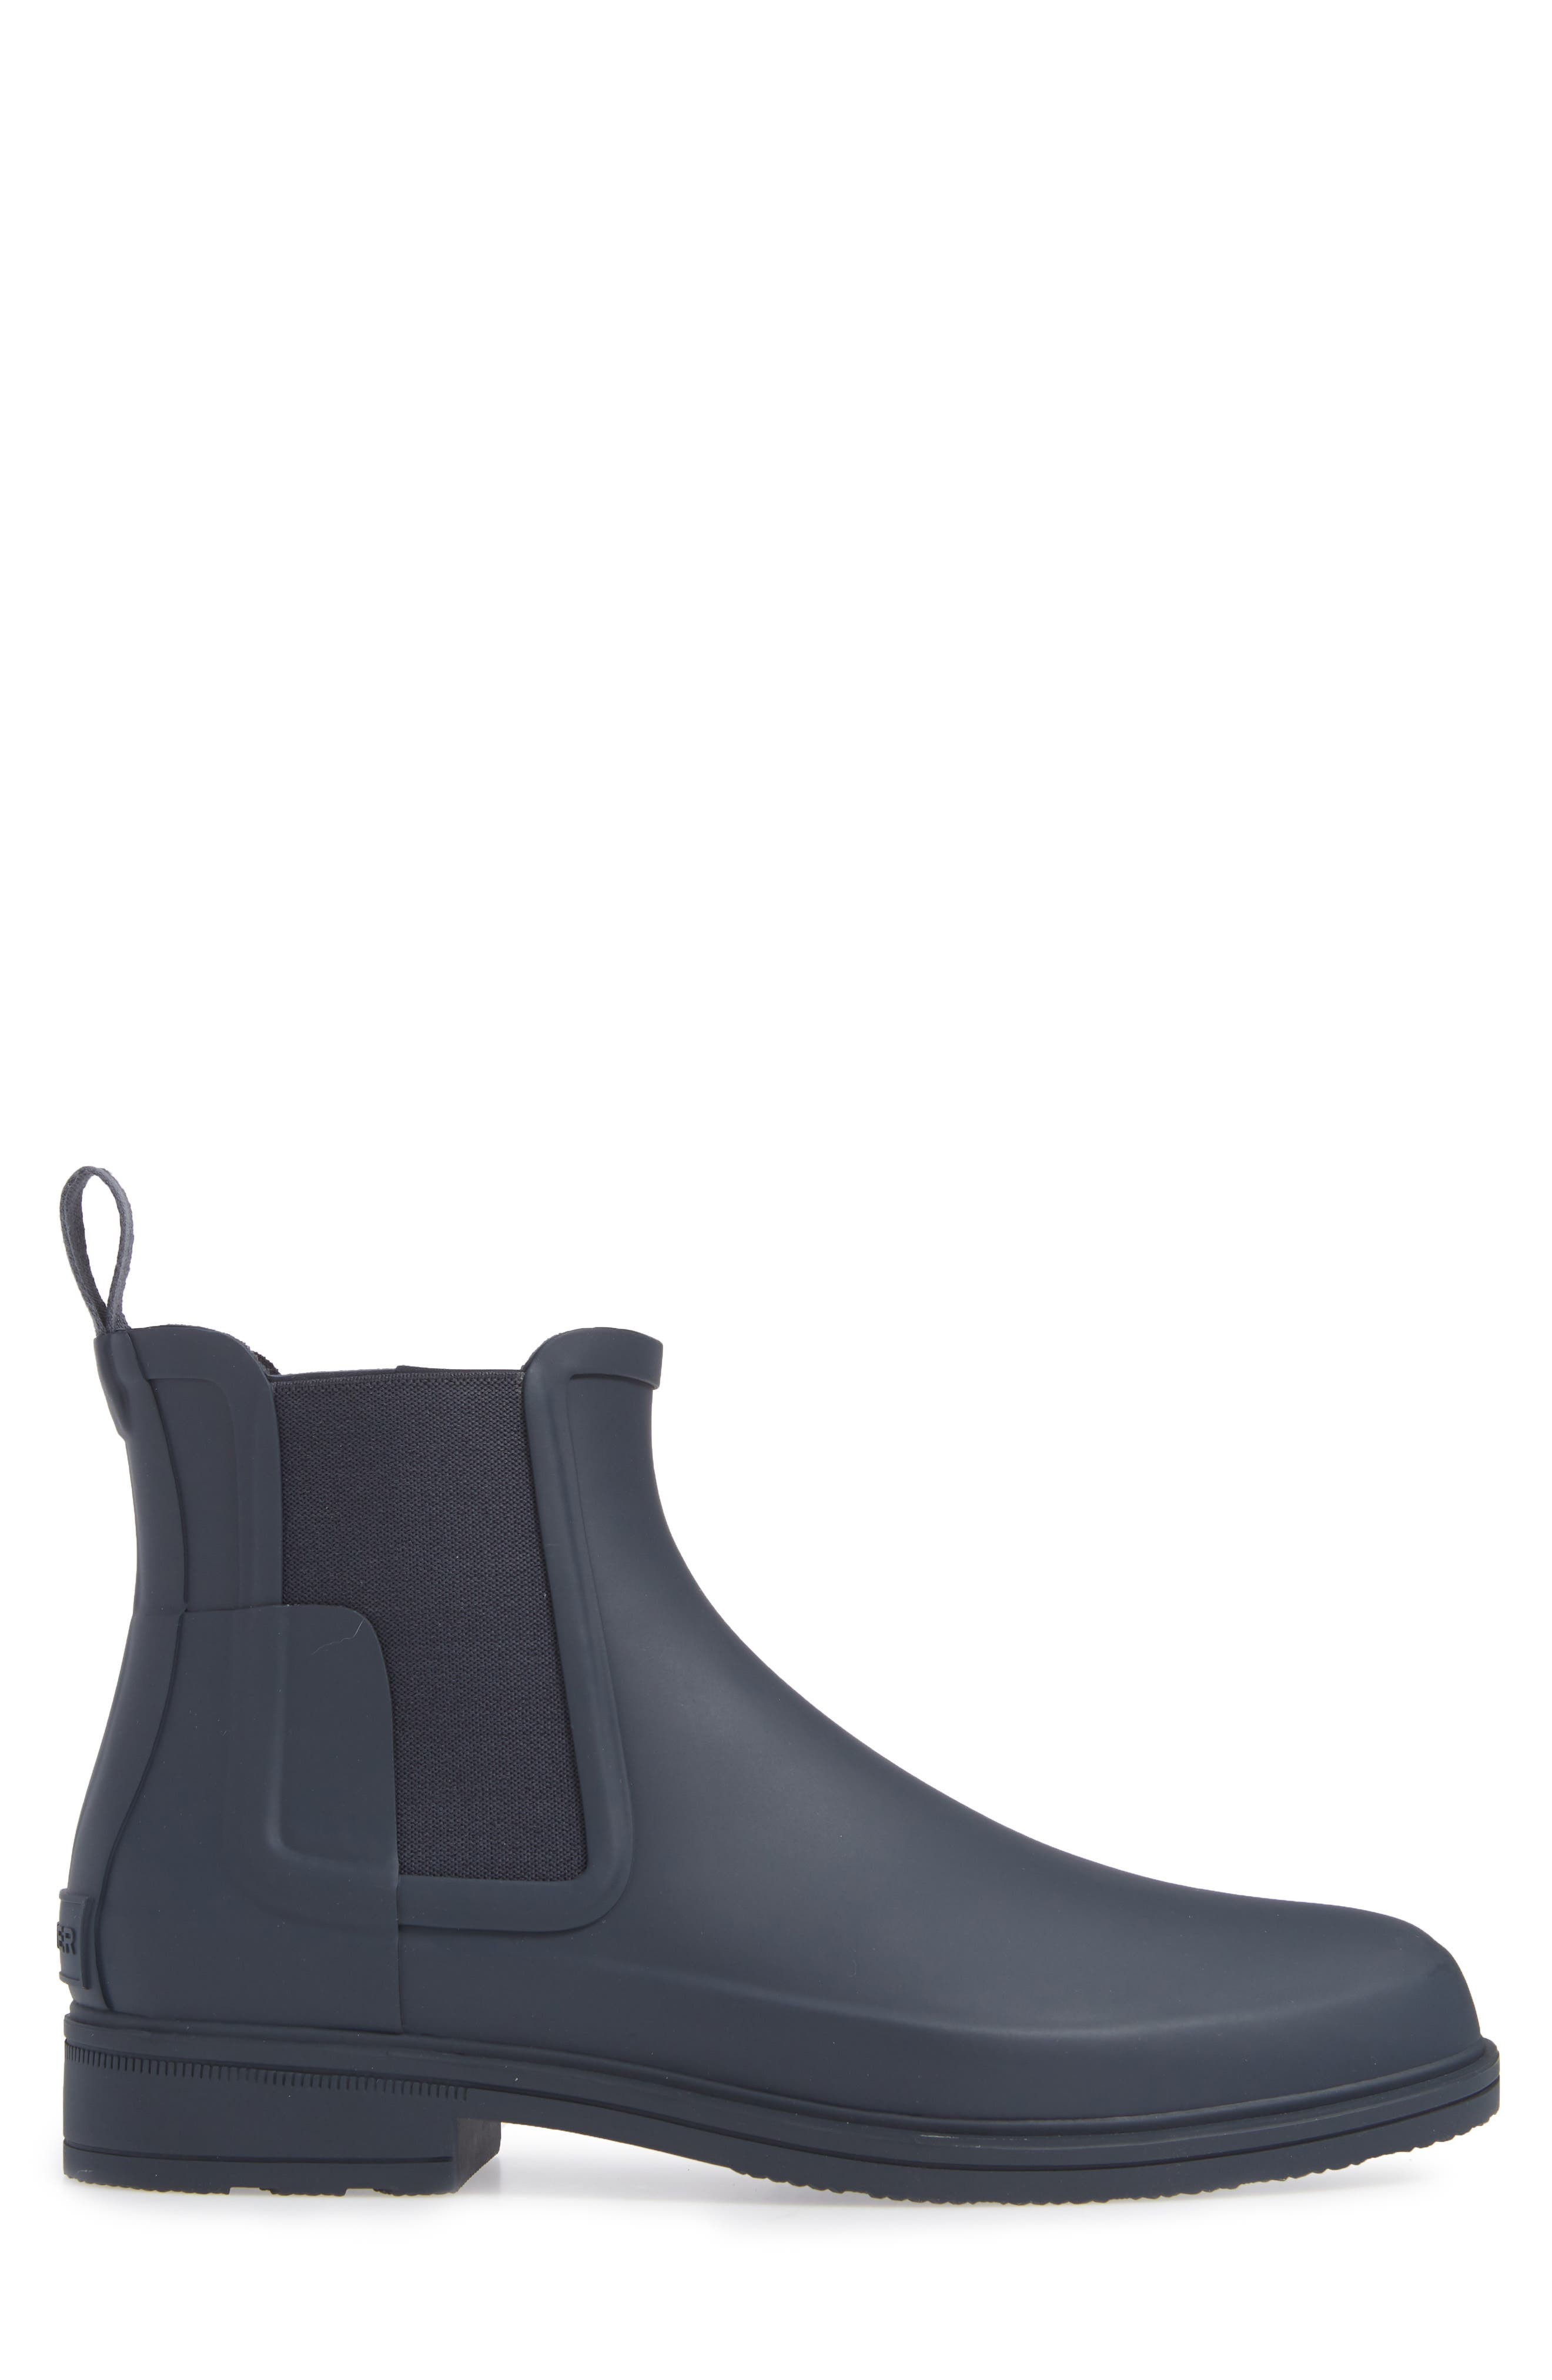 HUNTER,                             Original Refined Waterproof Chelsea Boot,                             Alternate thumbnail 3, color,                             NAVY RUBBER